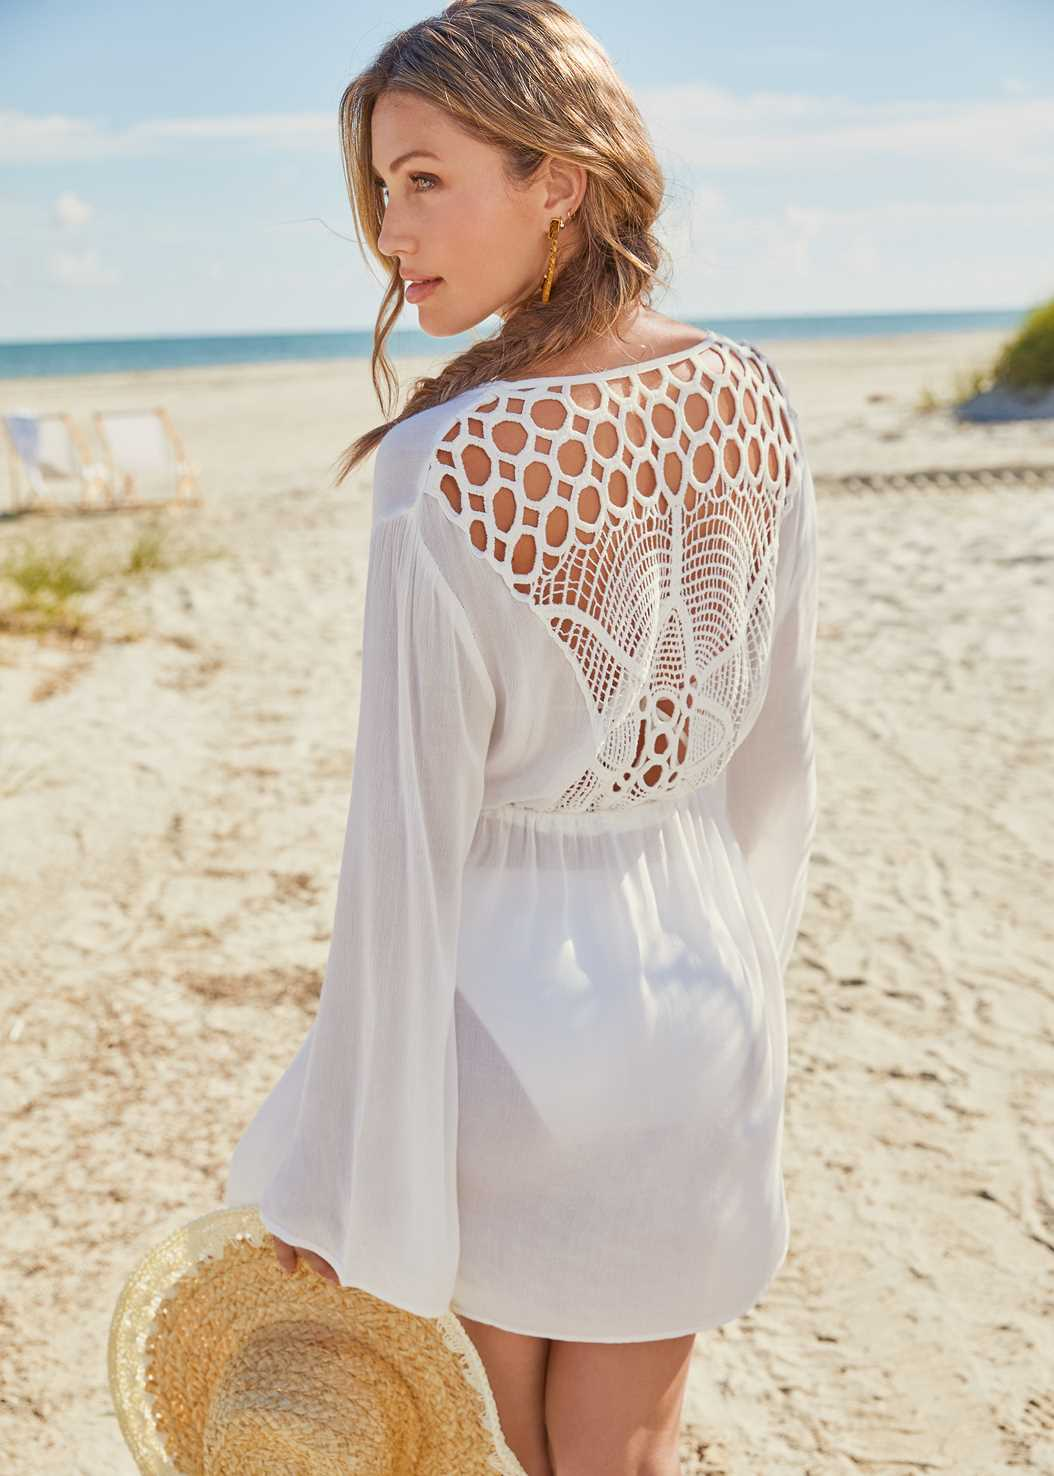 Crochet Detail Cover-Up,Triangle String Bikini Top,Scoop Front Classic Bikini Bottom ,Low Rise Classic Bikini Bottom ,Studded Flip Flops